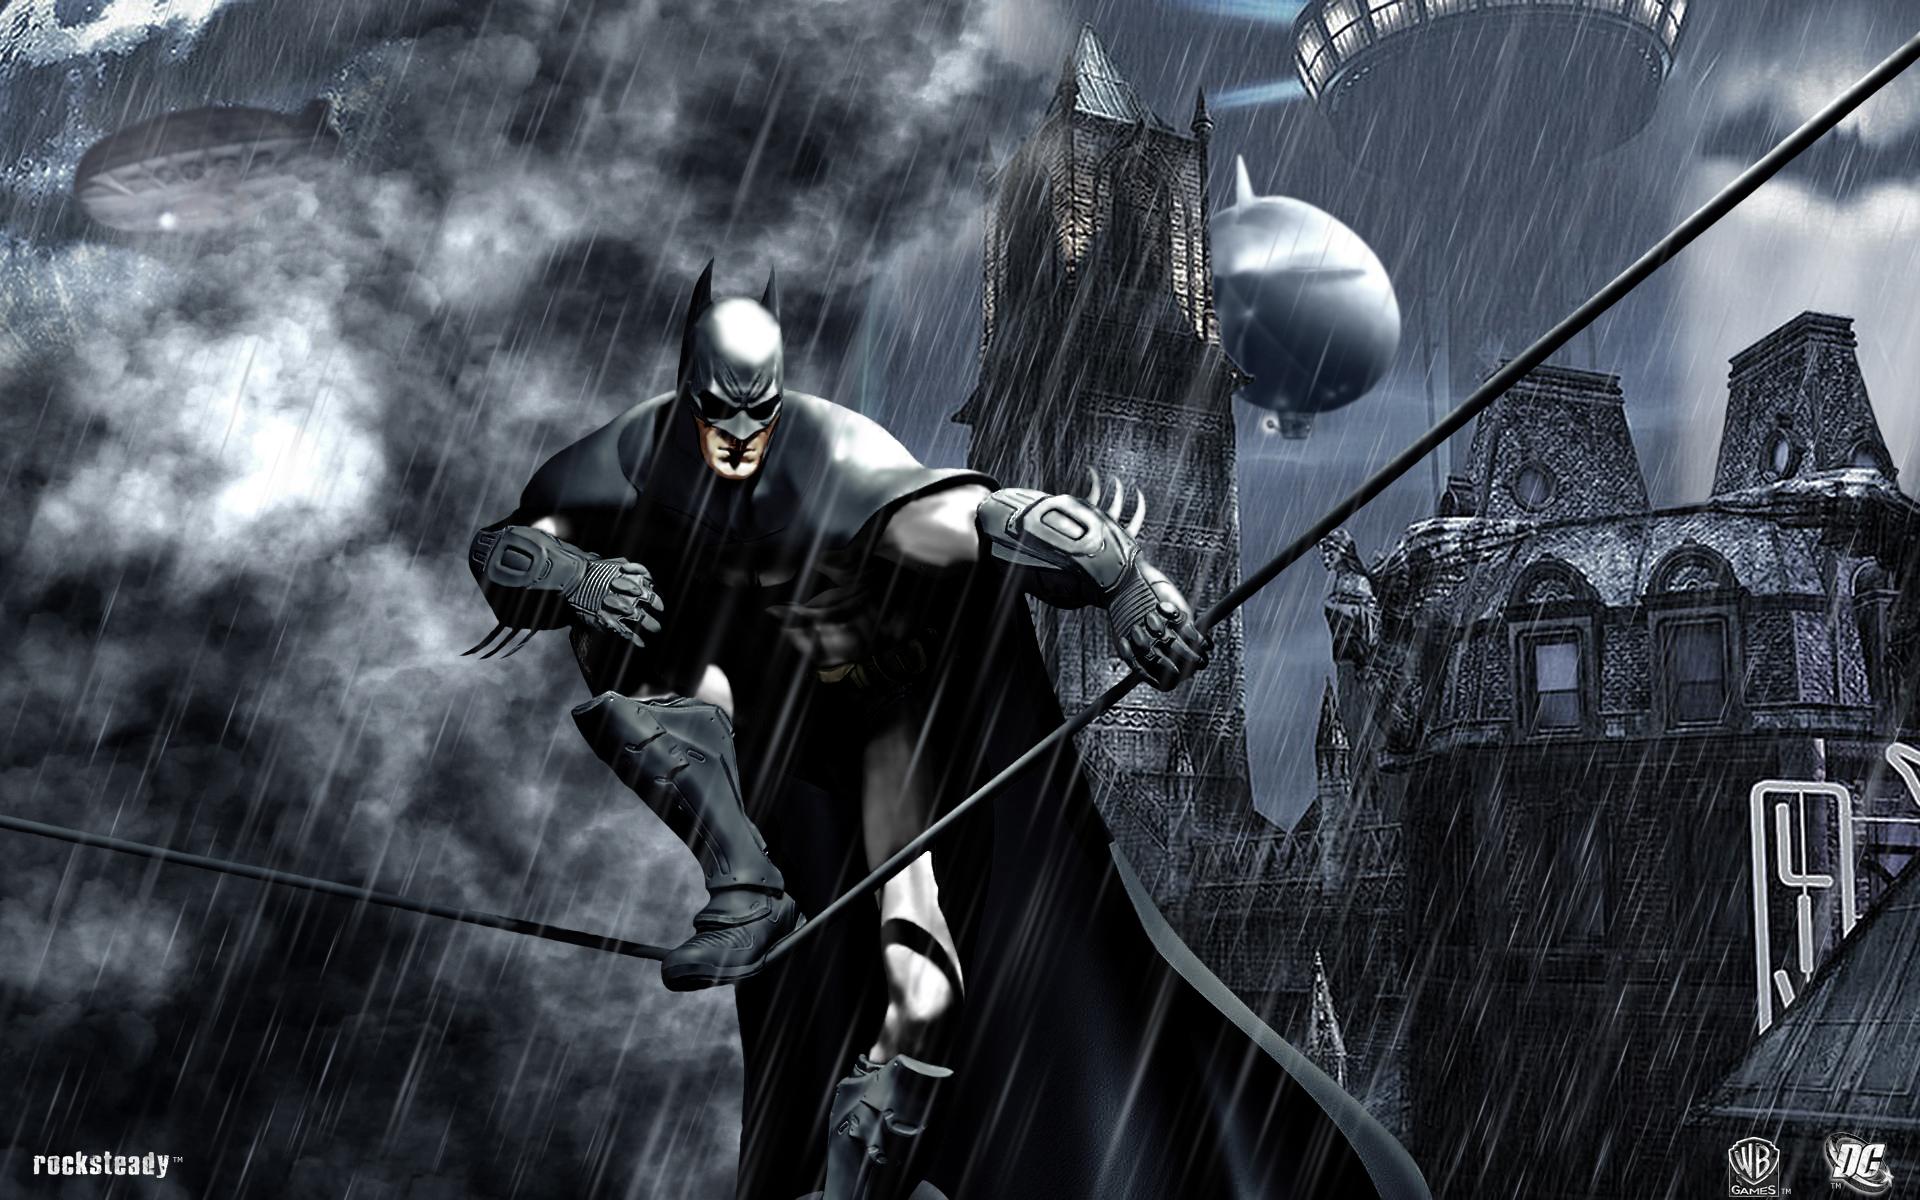 Batman Arkham City Wallpaper HD 1080p Widescreen Desktop 1920x1200